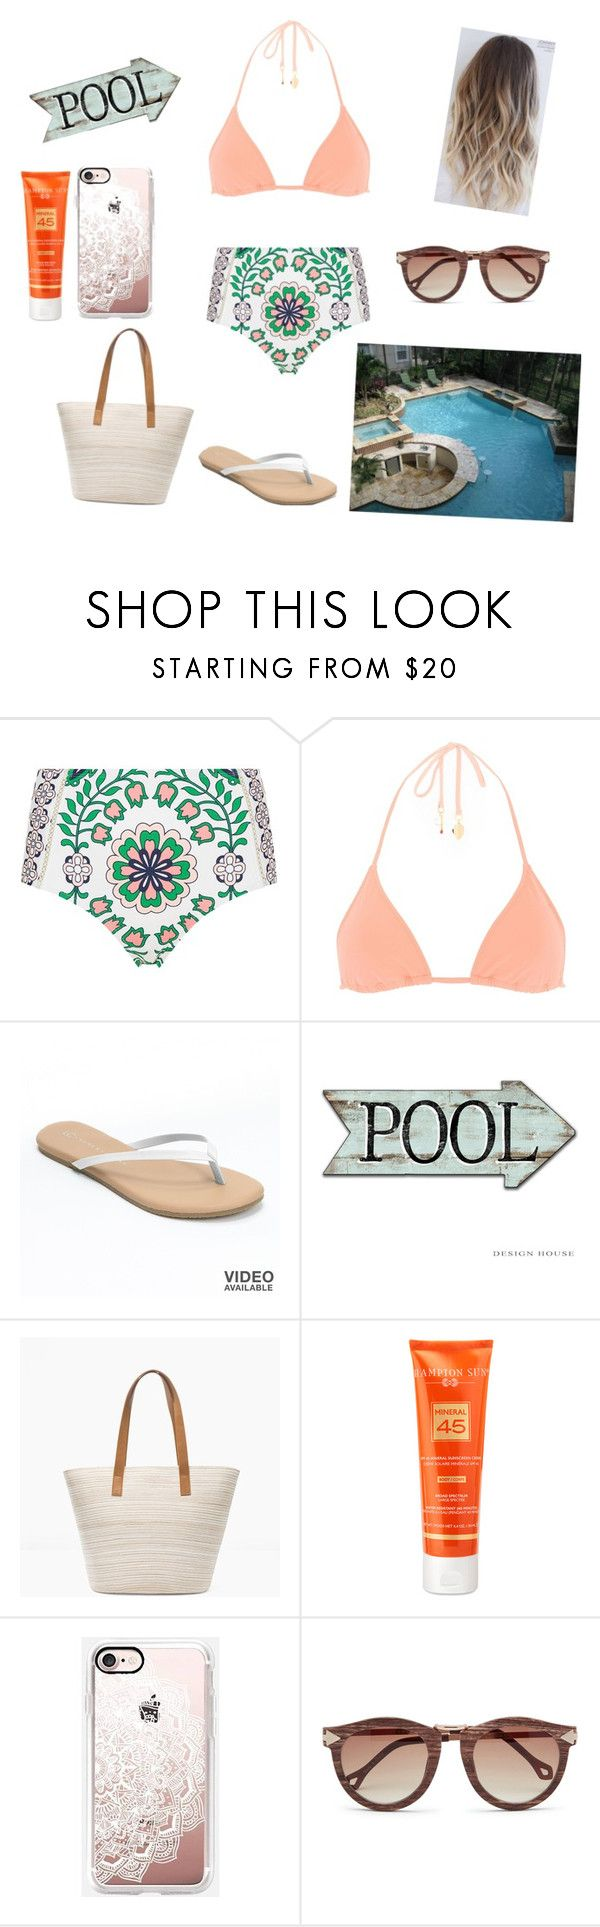 """Pool #3"" by peterkonijn on Polyvore featuring mode, Tory Burch, STELLA McCARTNEY, LC Lauren Conrad, Chico's, Hampton Sun en Casetify"